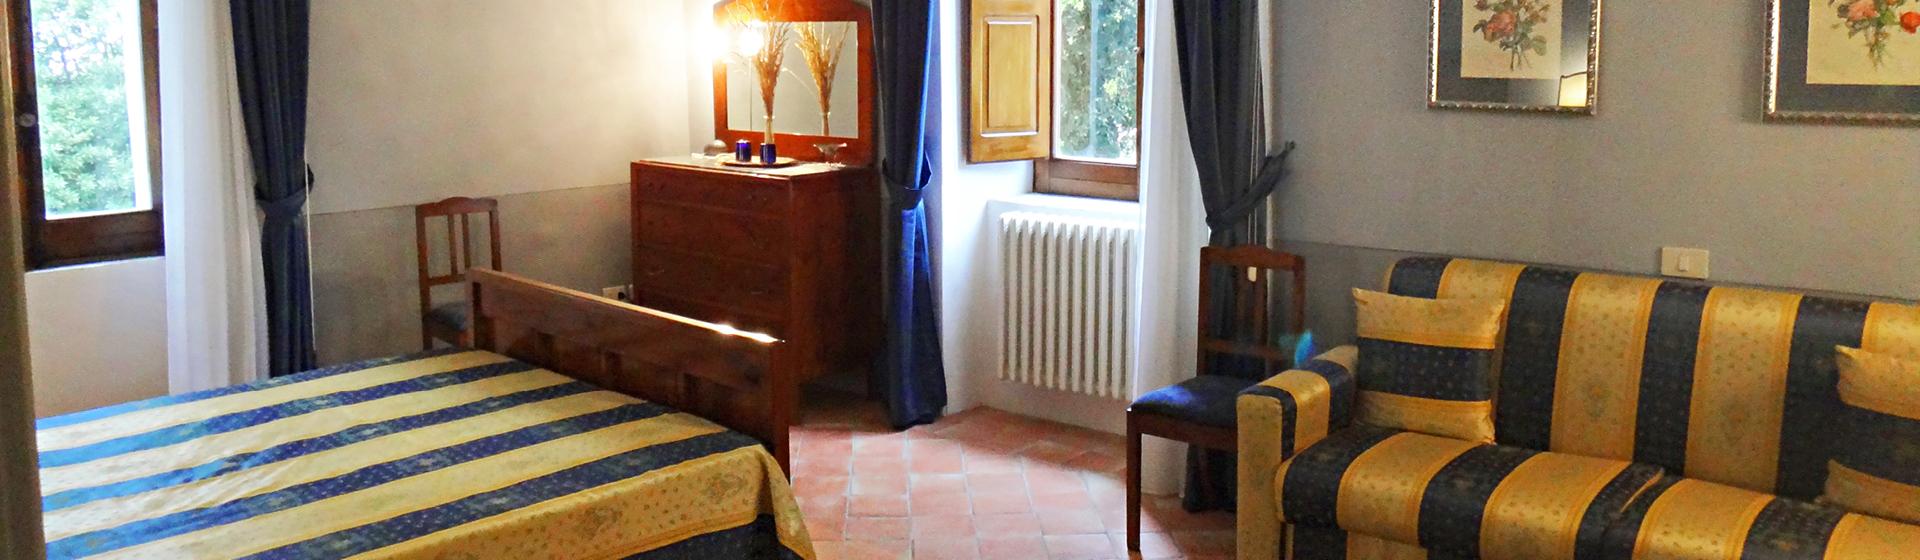 01_Divano Suite Blu B&B Casa Albini 1